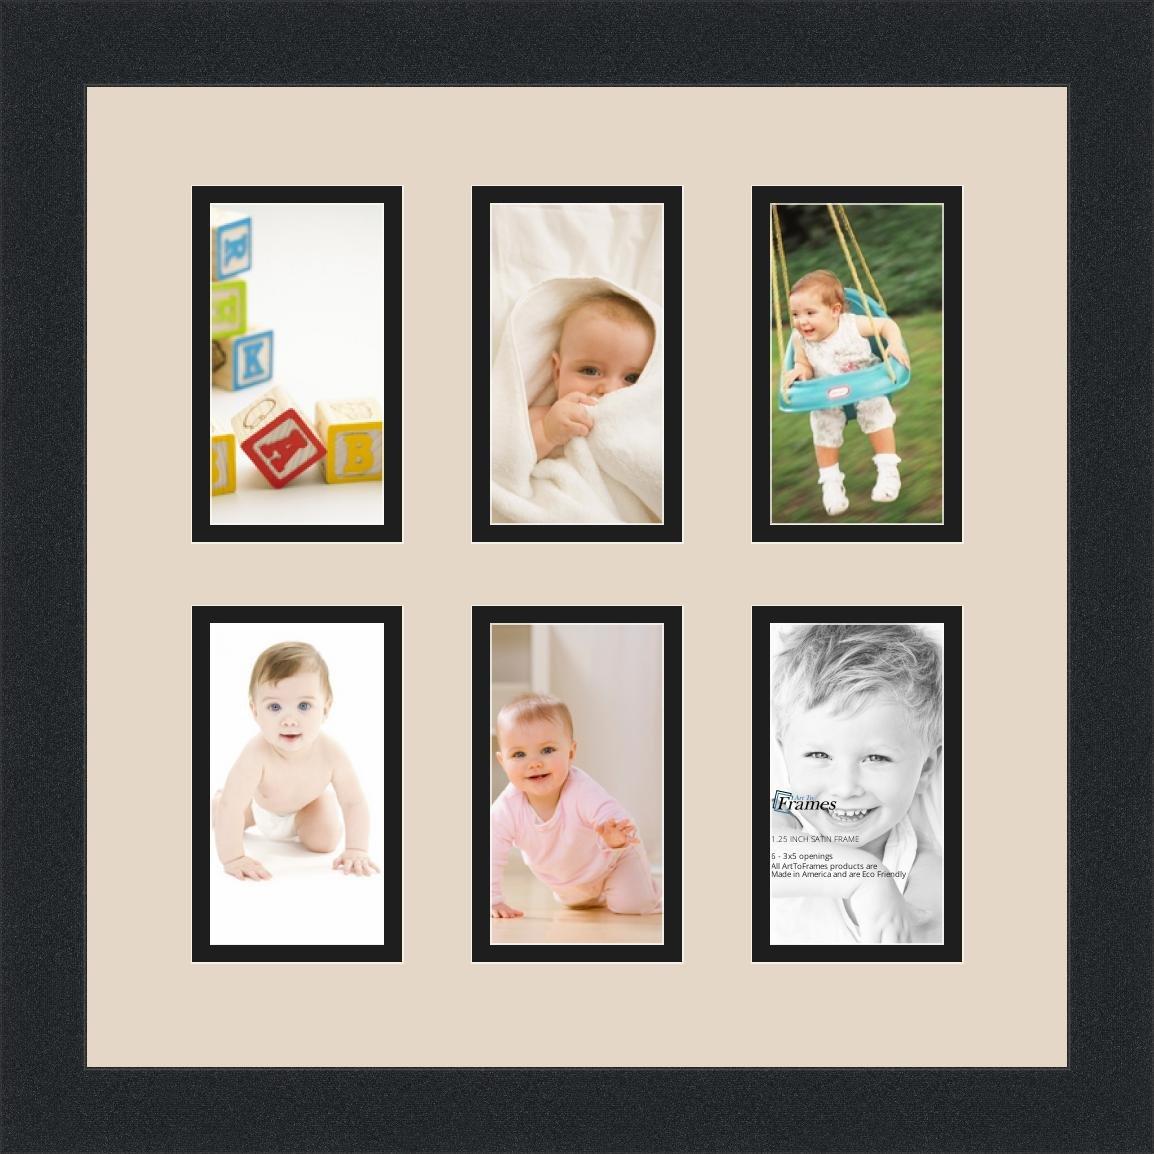 Amazon.de: arttoframes Alphabet Fotografie Bild Rahmen mit 6-3 x 5 ...